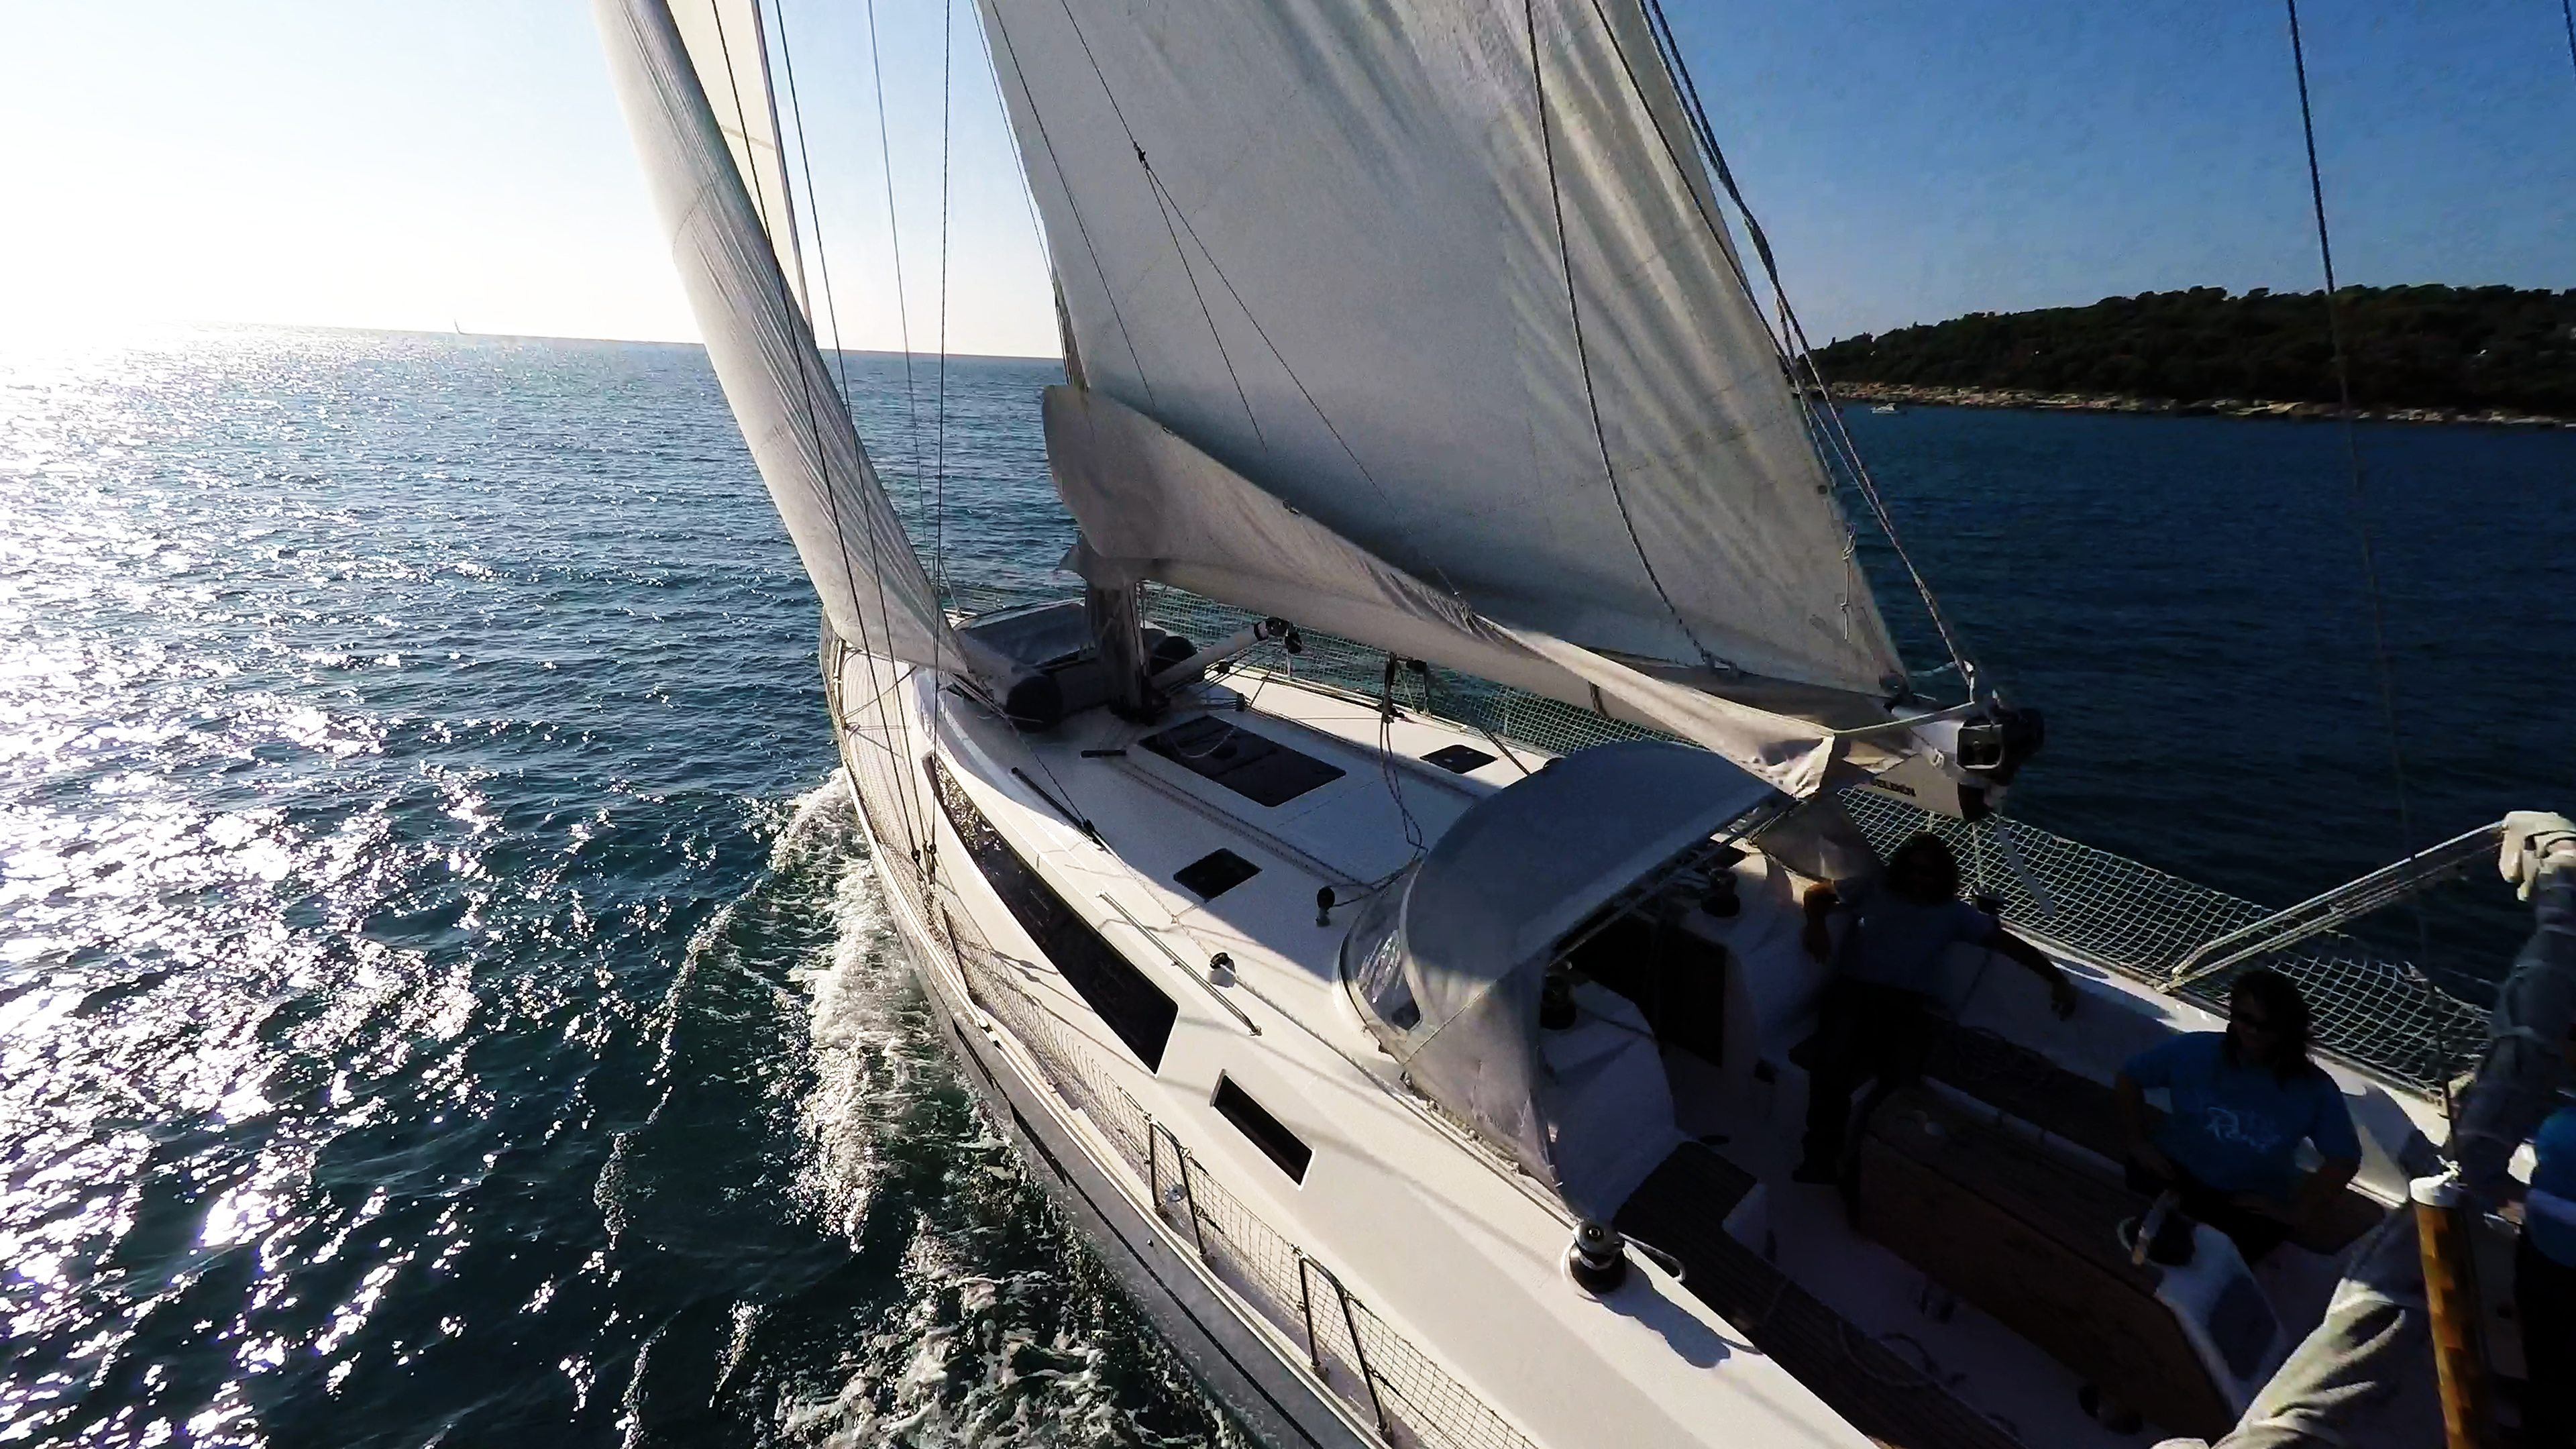 barcha a vela yacht a vela mare sole barca a vela pozzetto vele